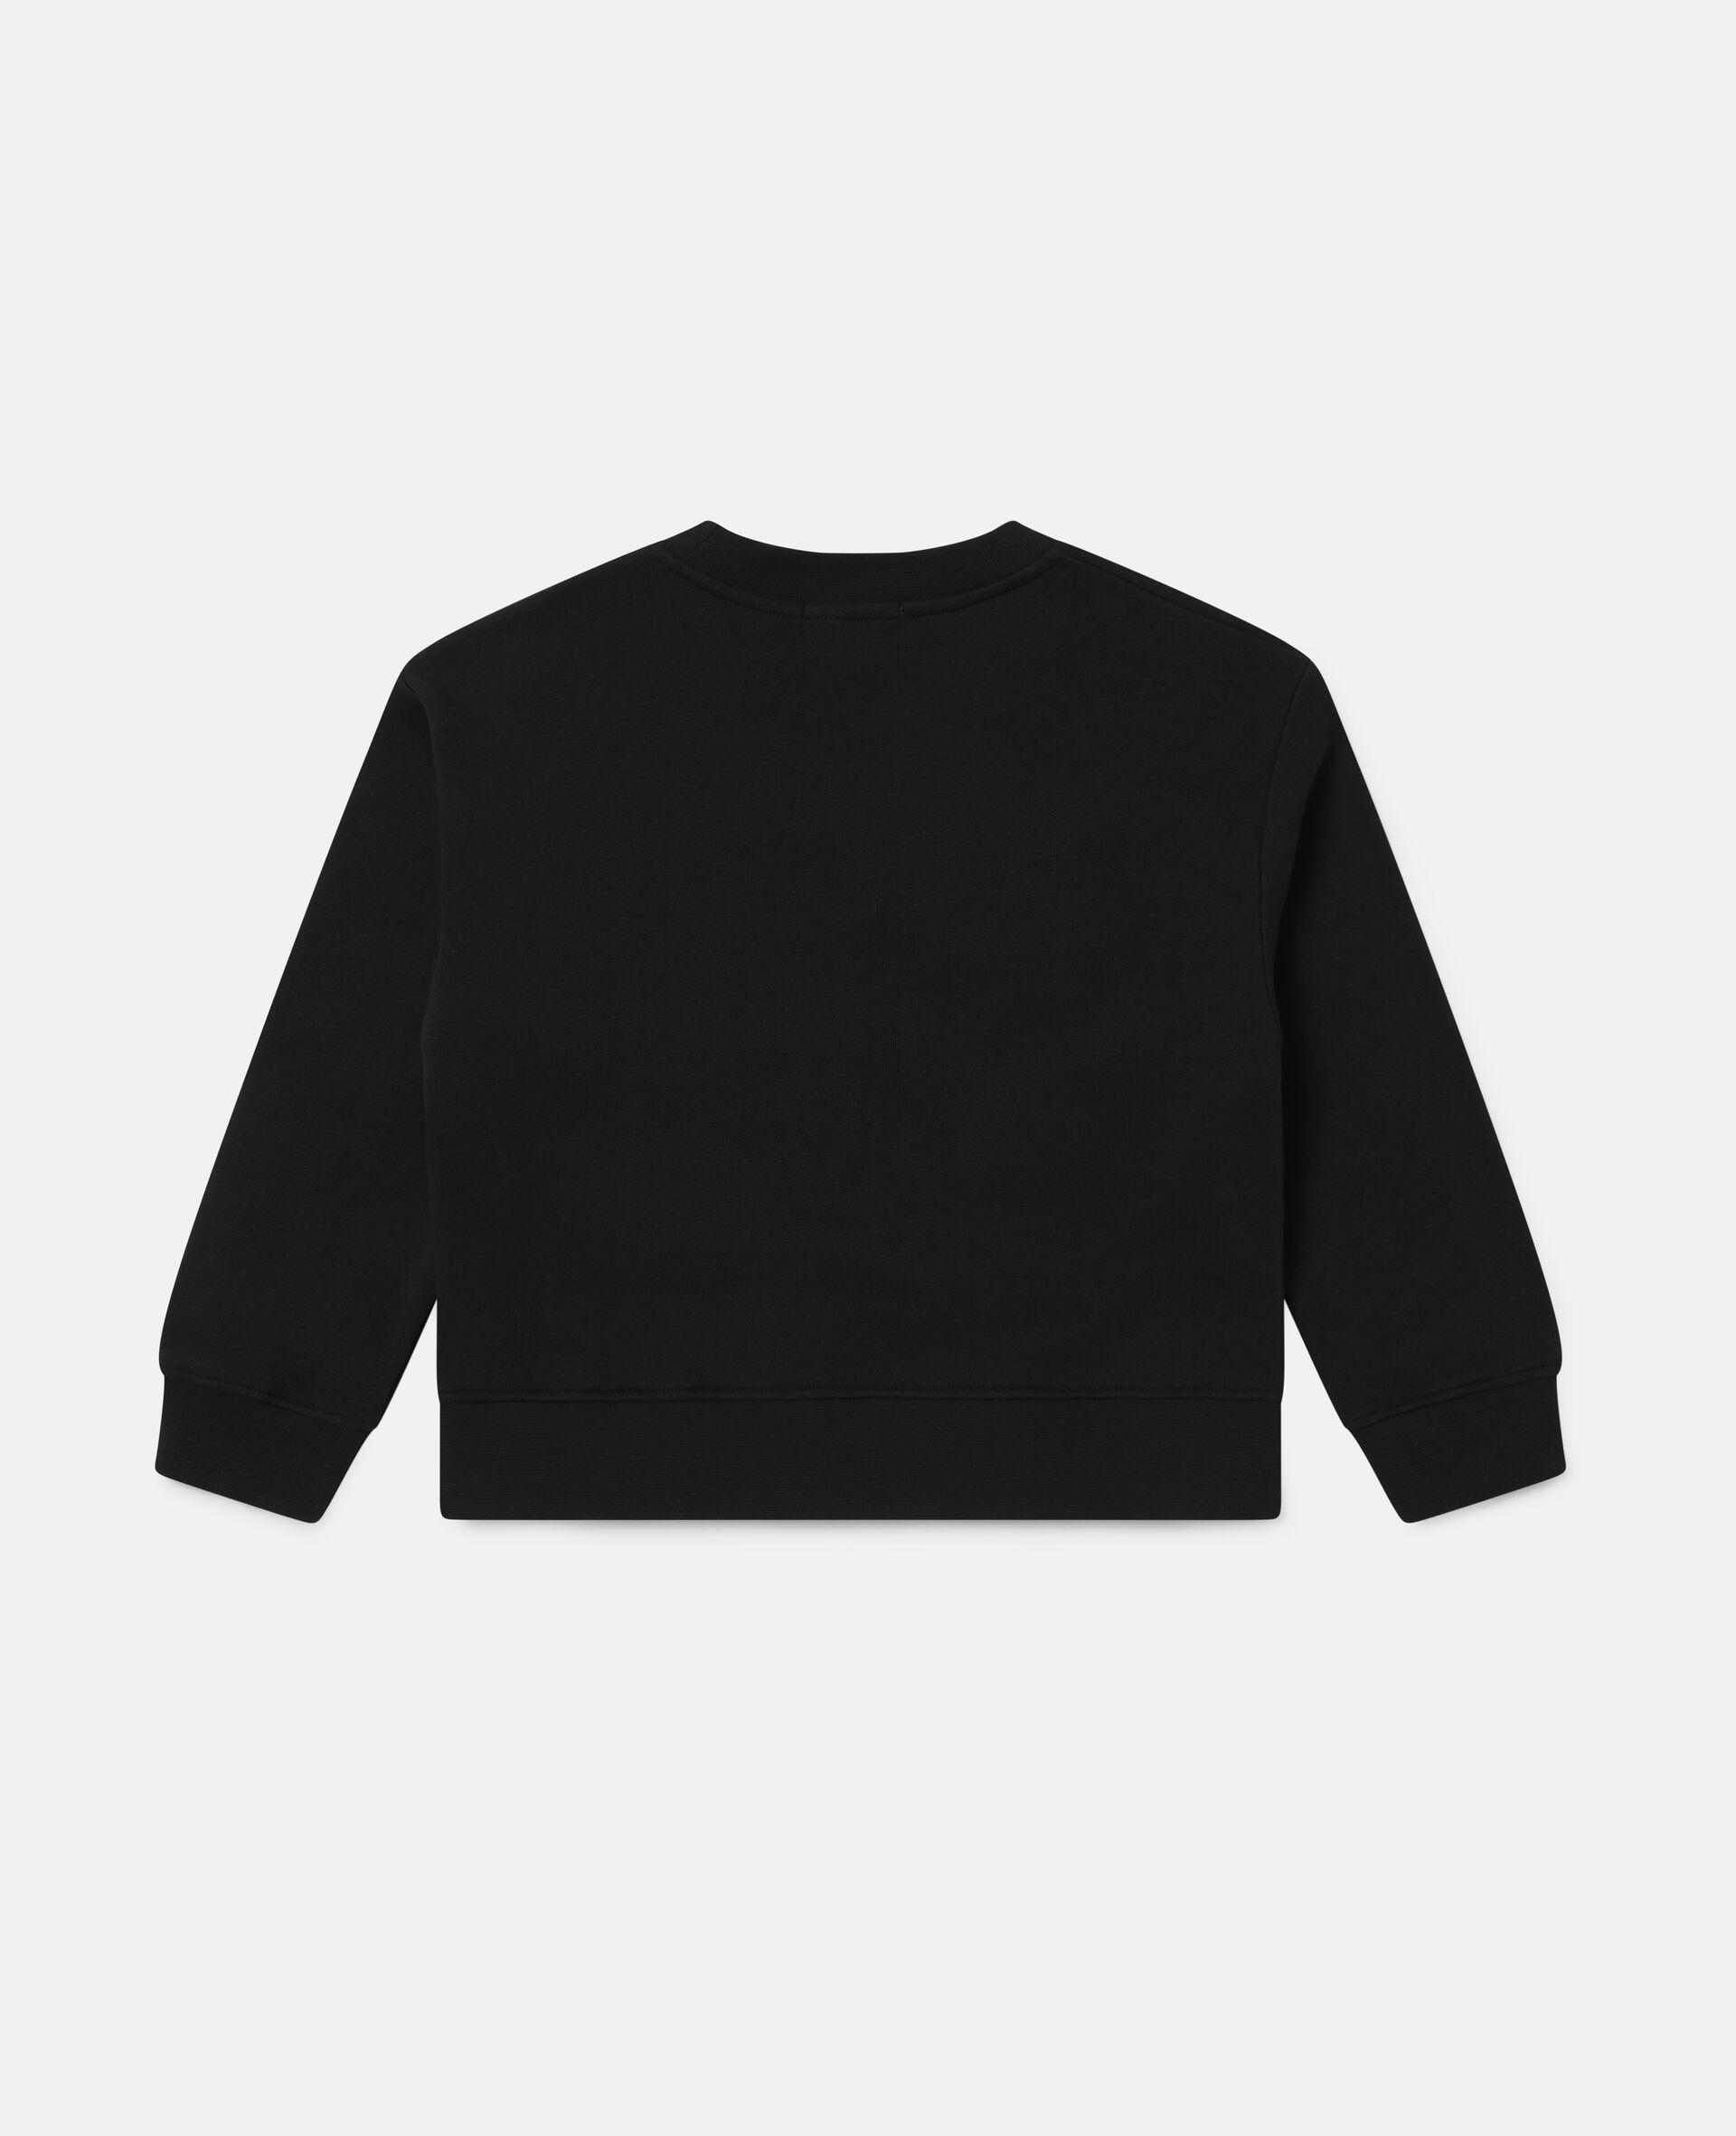 Spotty Flower Oversize Cotton Fleece Sweatshirt-Black-large image number 3